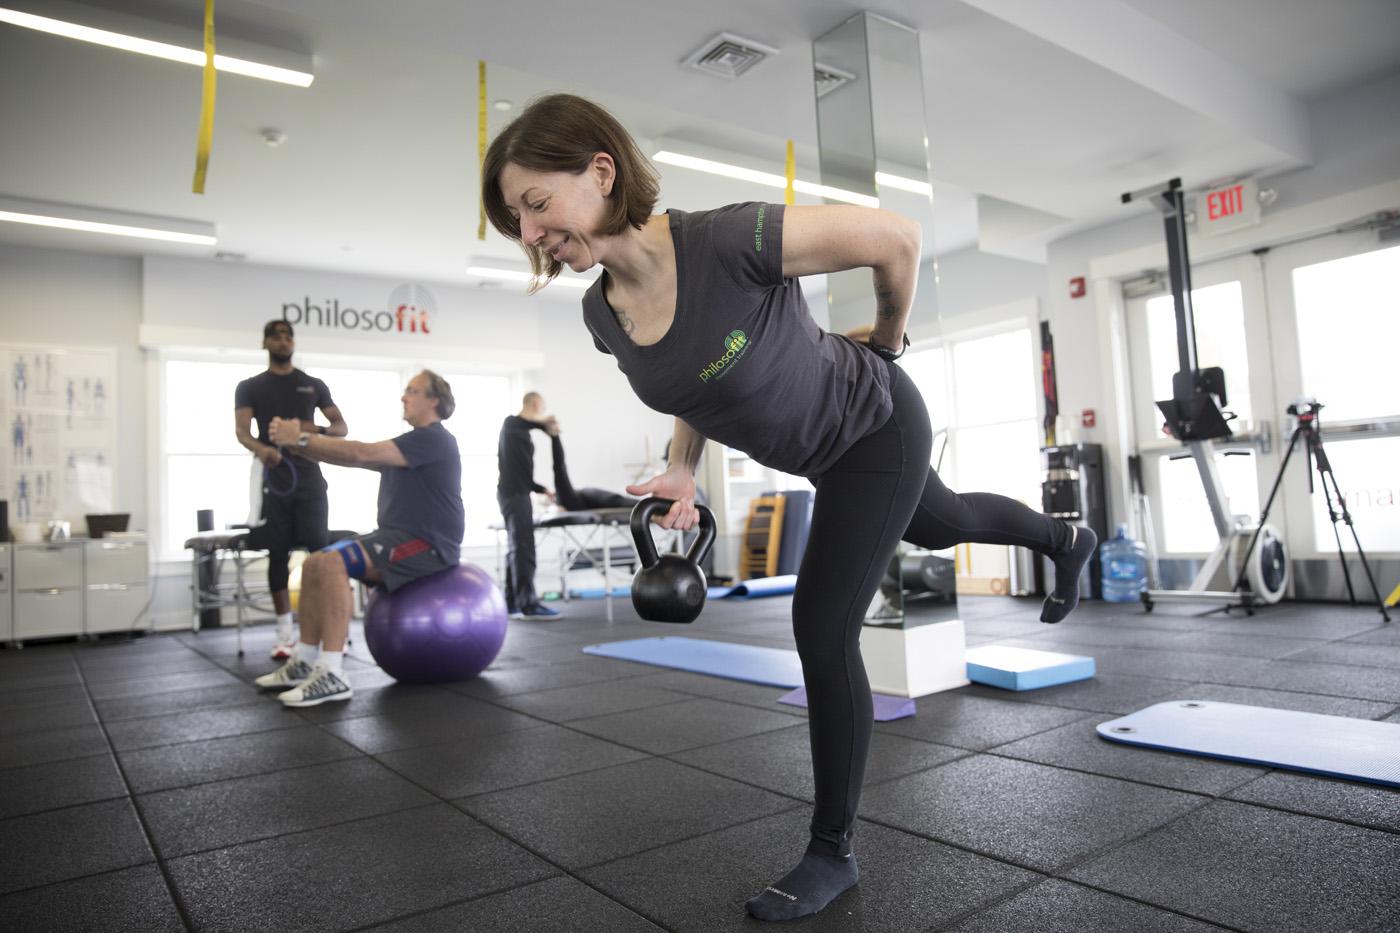 Philosofit_East_Hamptons_Fitness_Personal_Training_1310.jpg